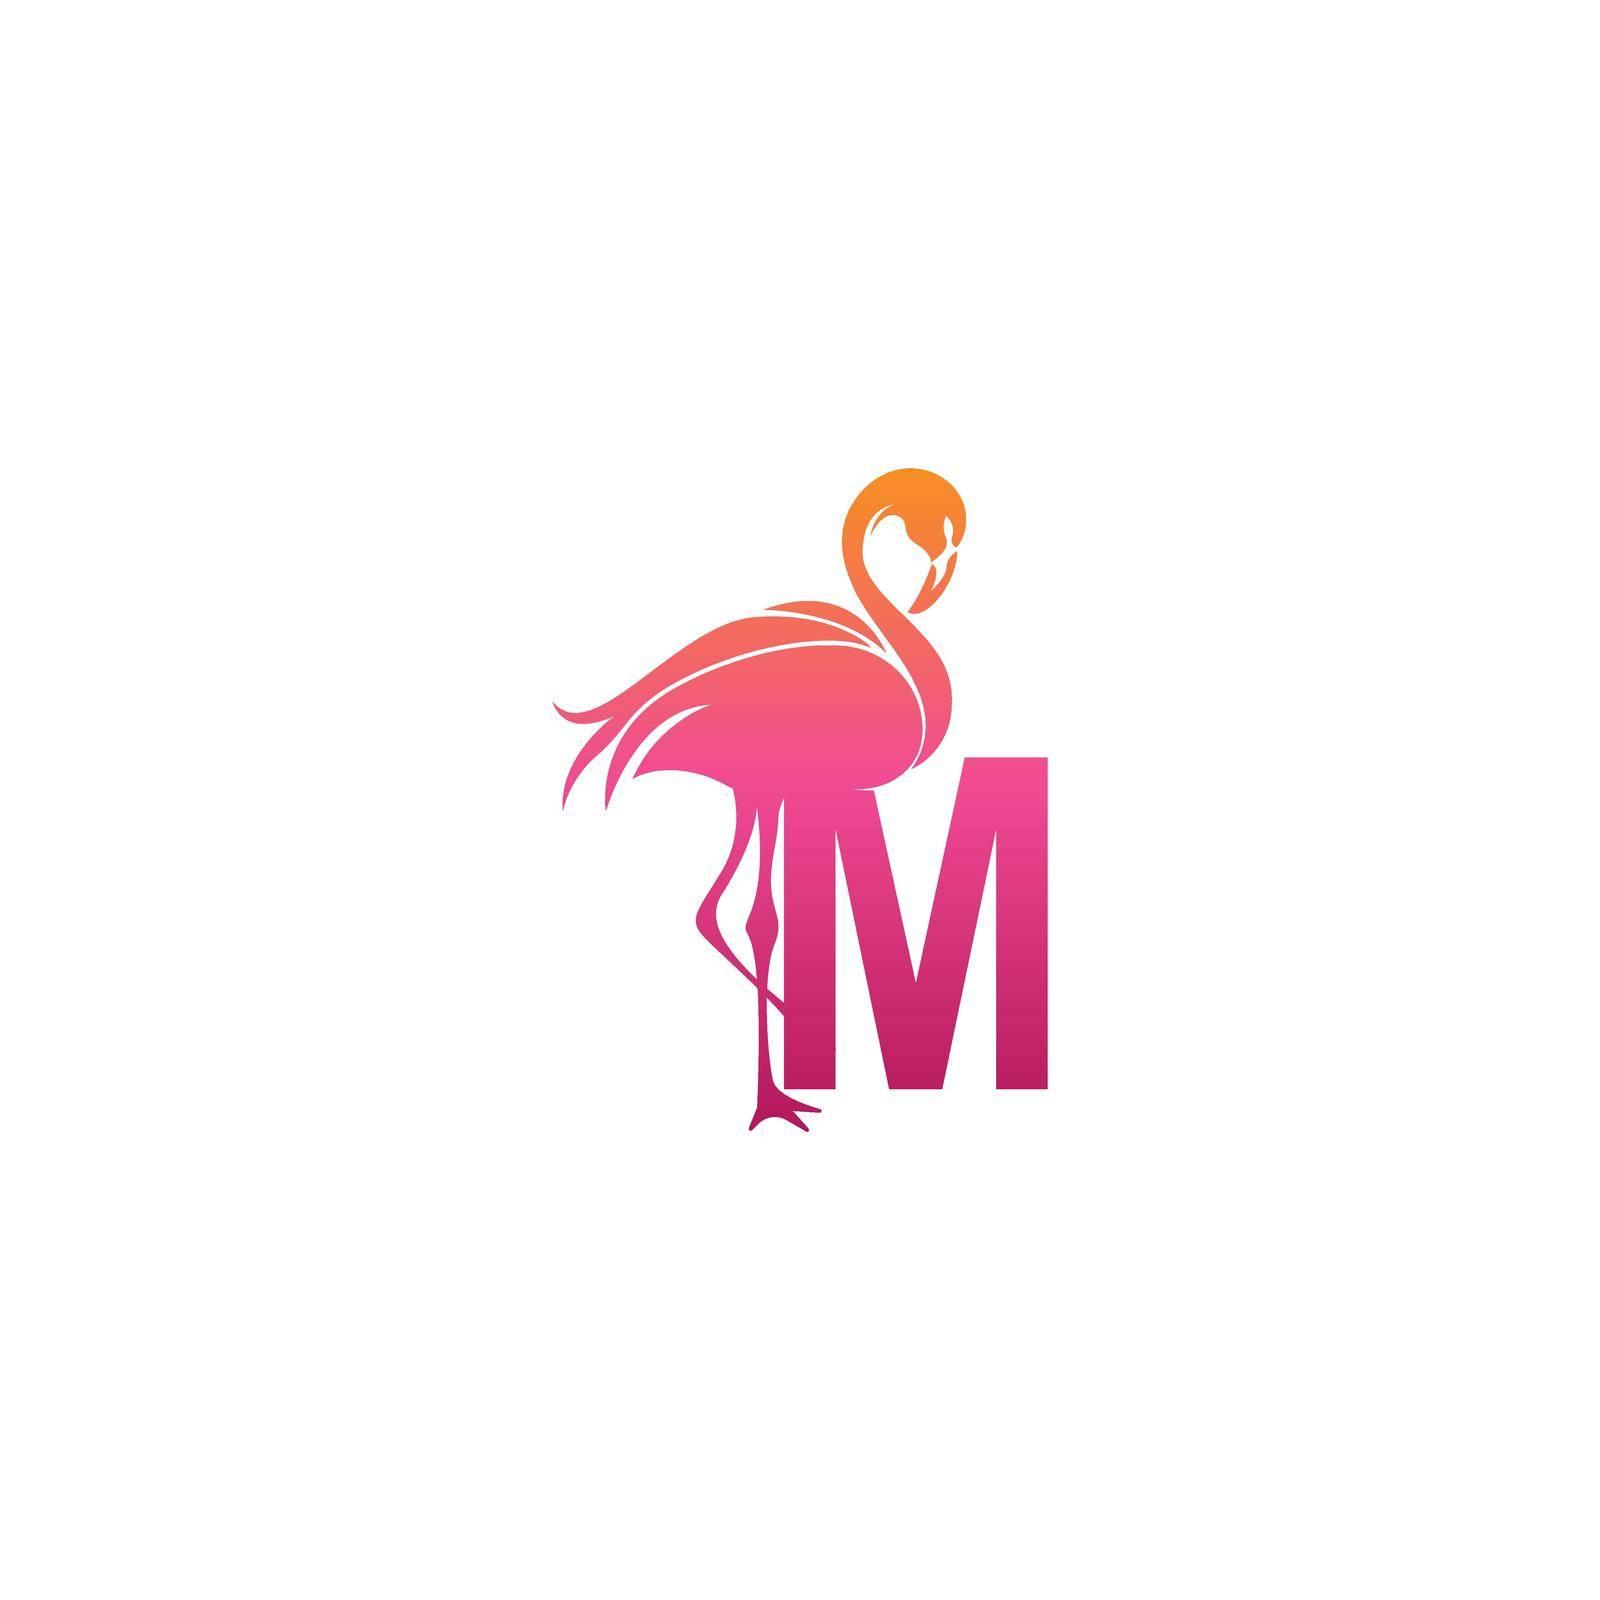 Flamingo bird icon with letter M Logo design vector template